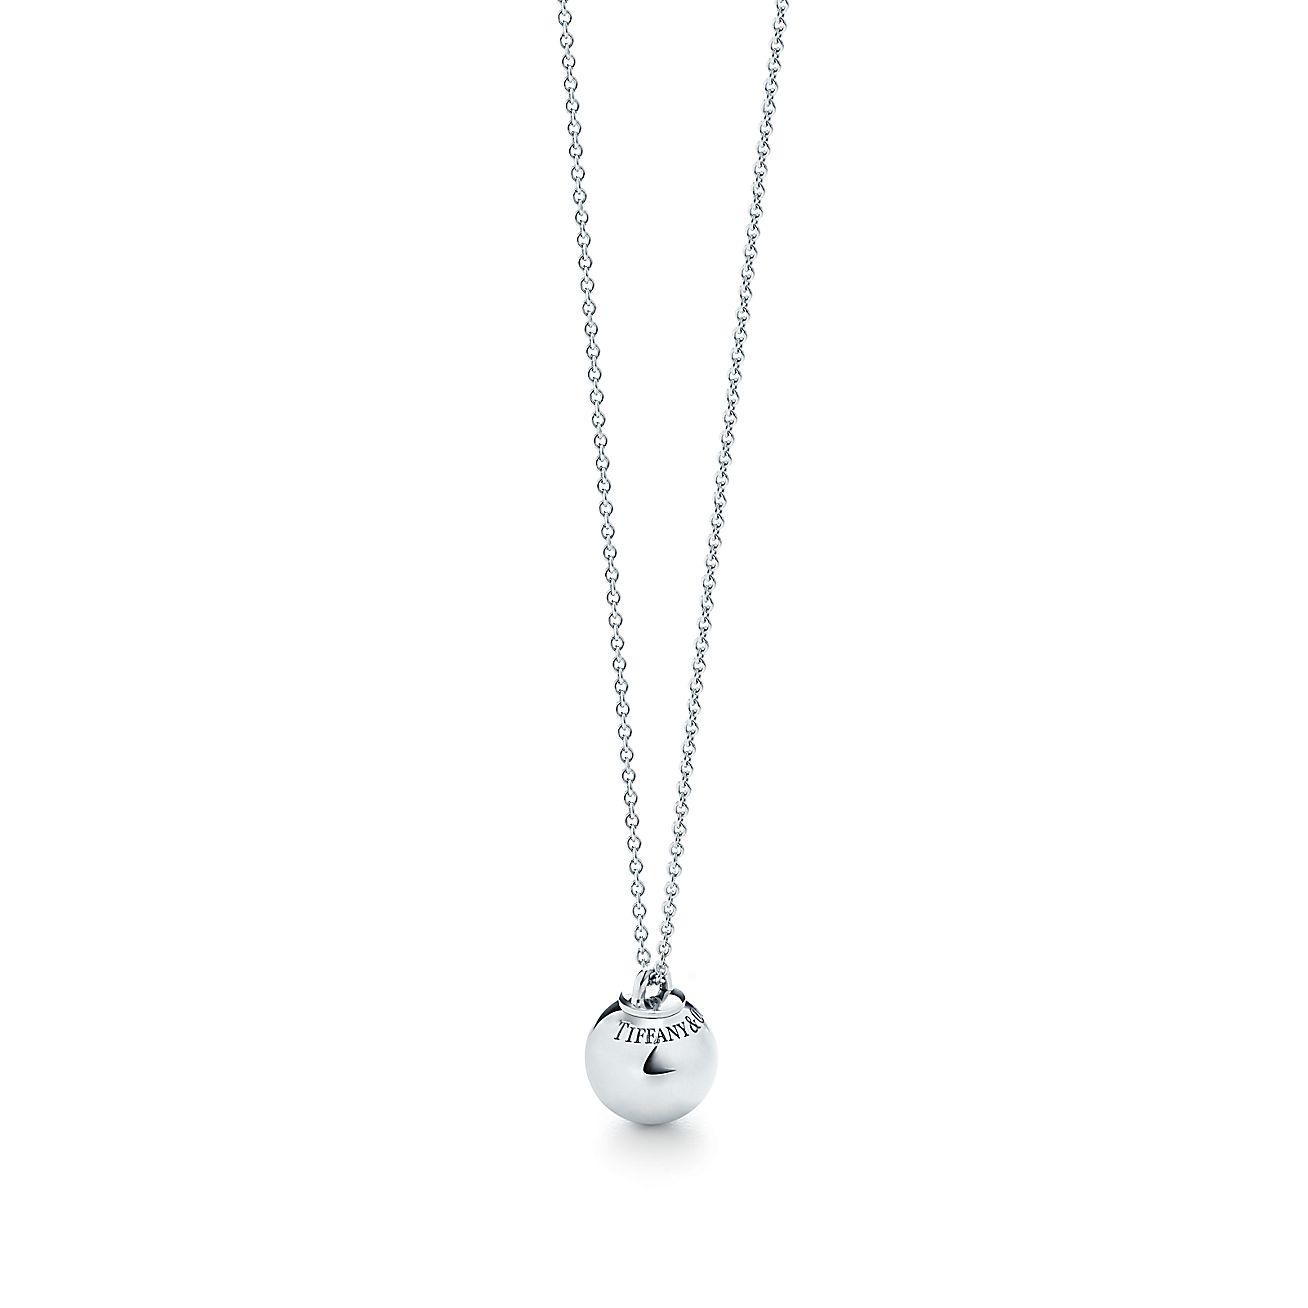 3a85afc33 Tiffany Hardwear Sterling Silver Ball Pendant Co. Tiffany Co Atlas Tag Pendant  Necklace ...